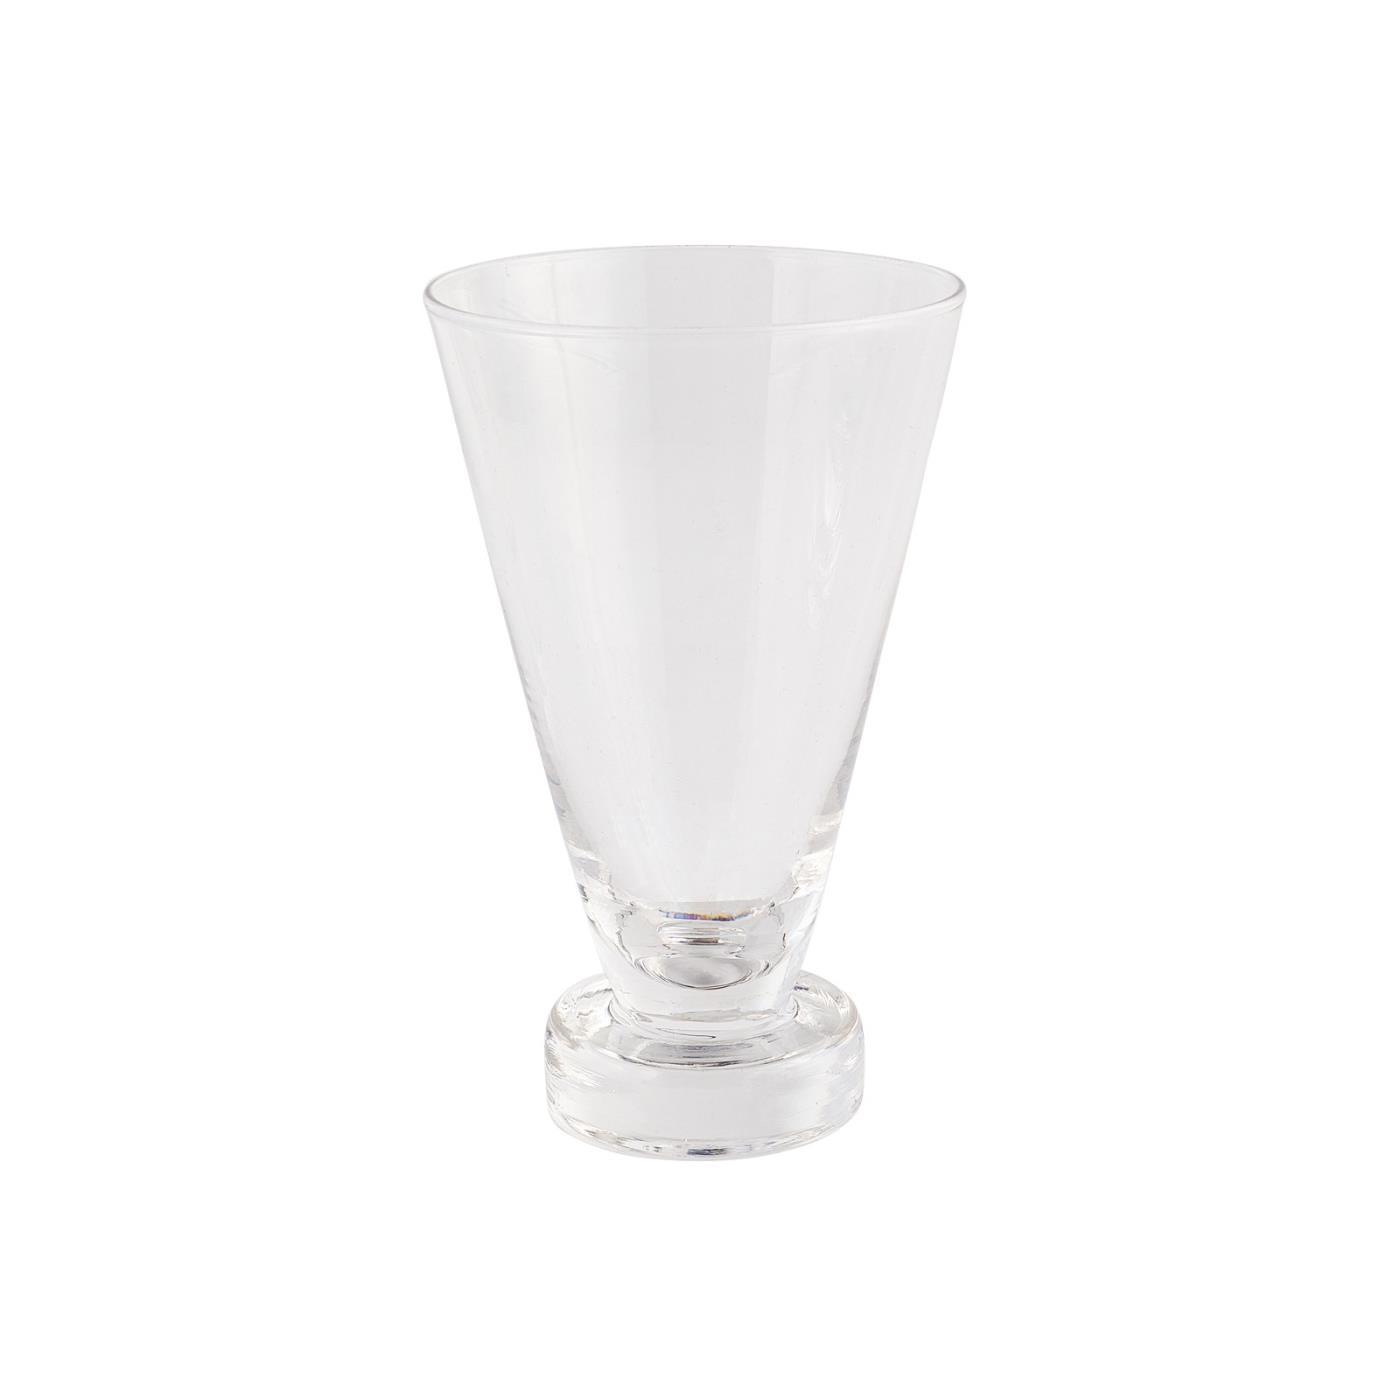 Tini Port Glass